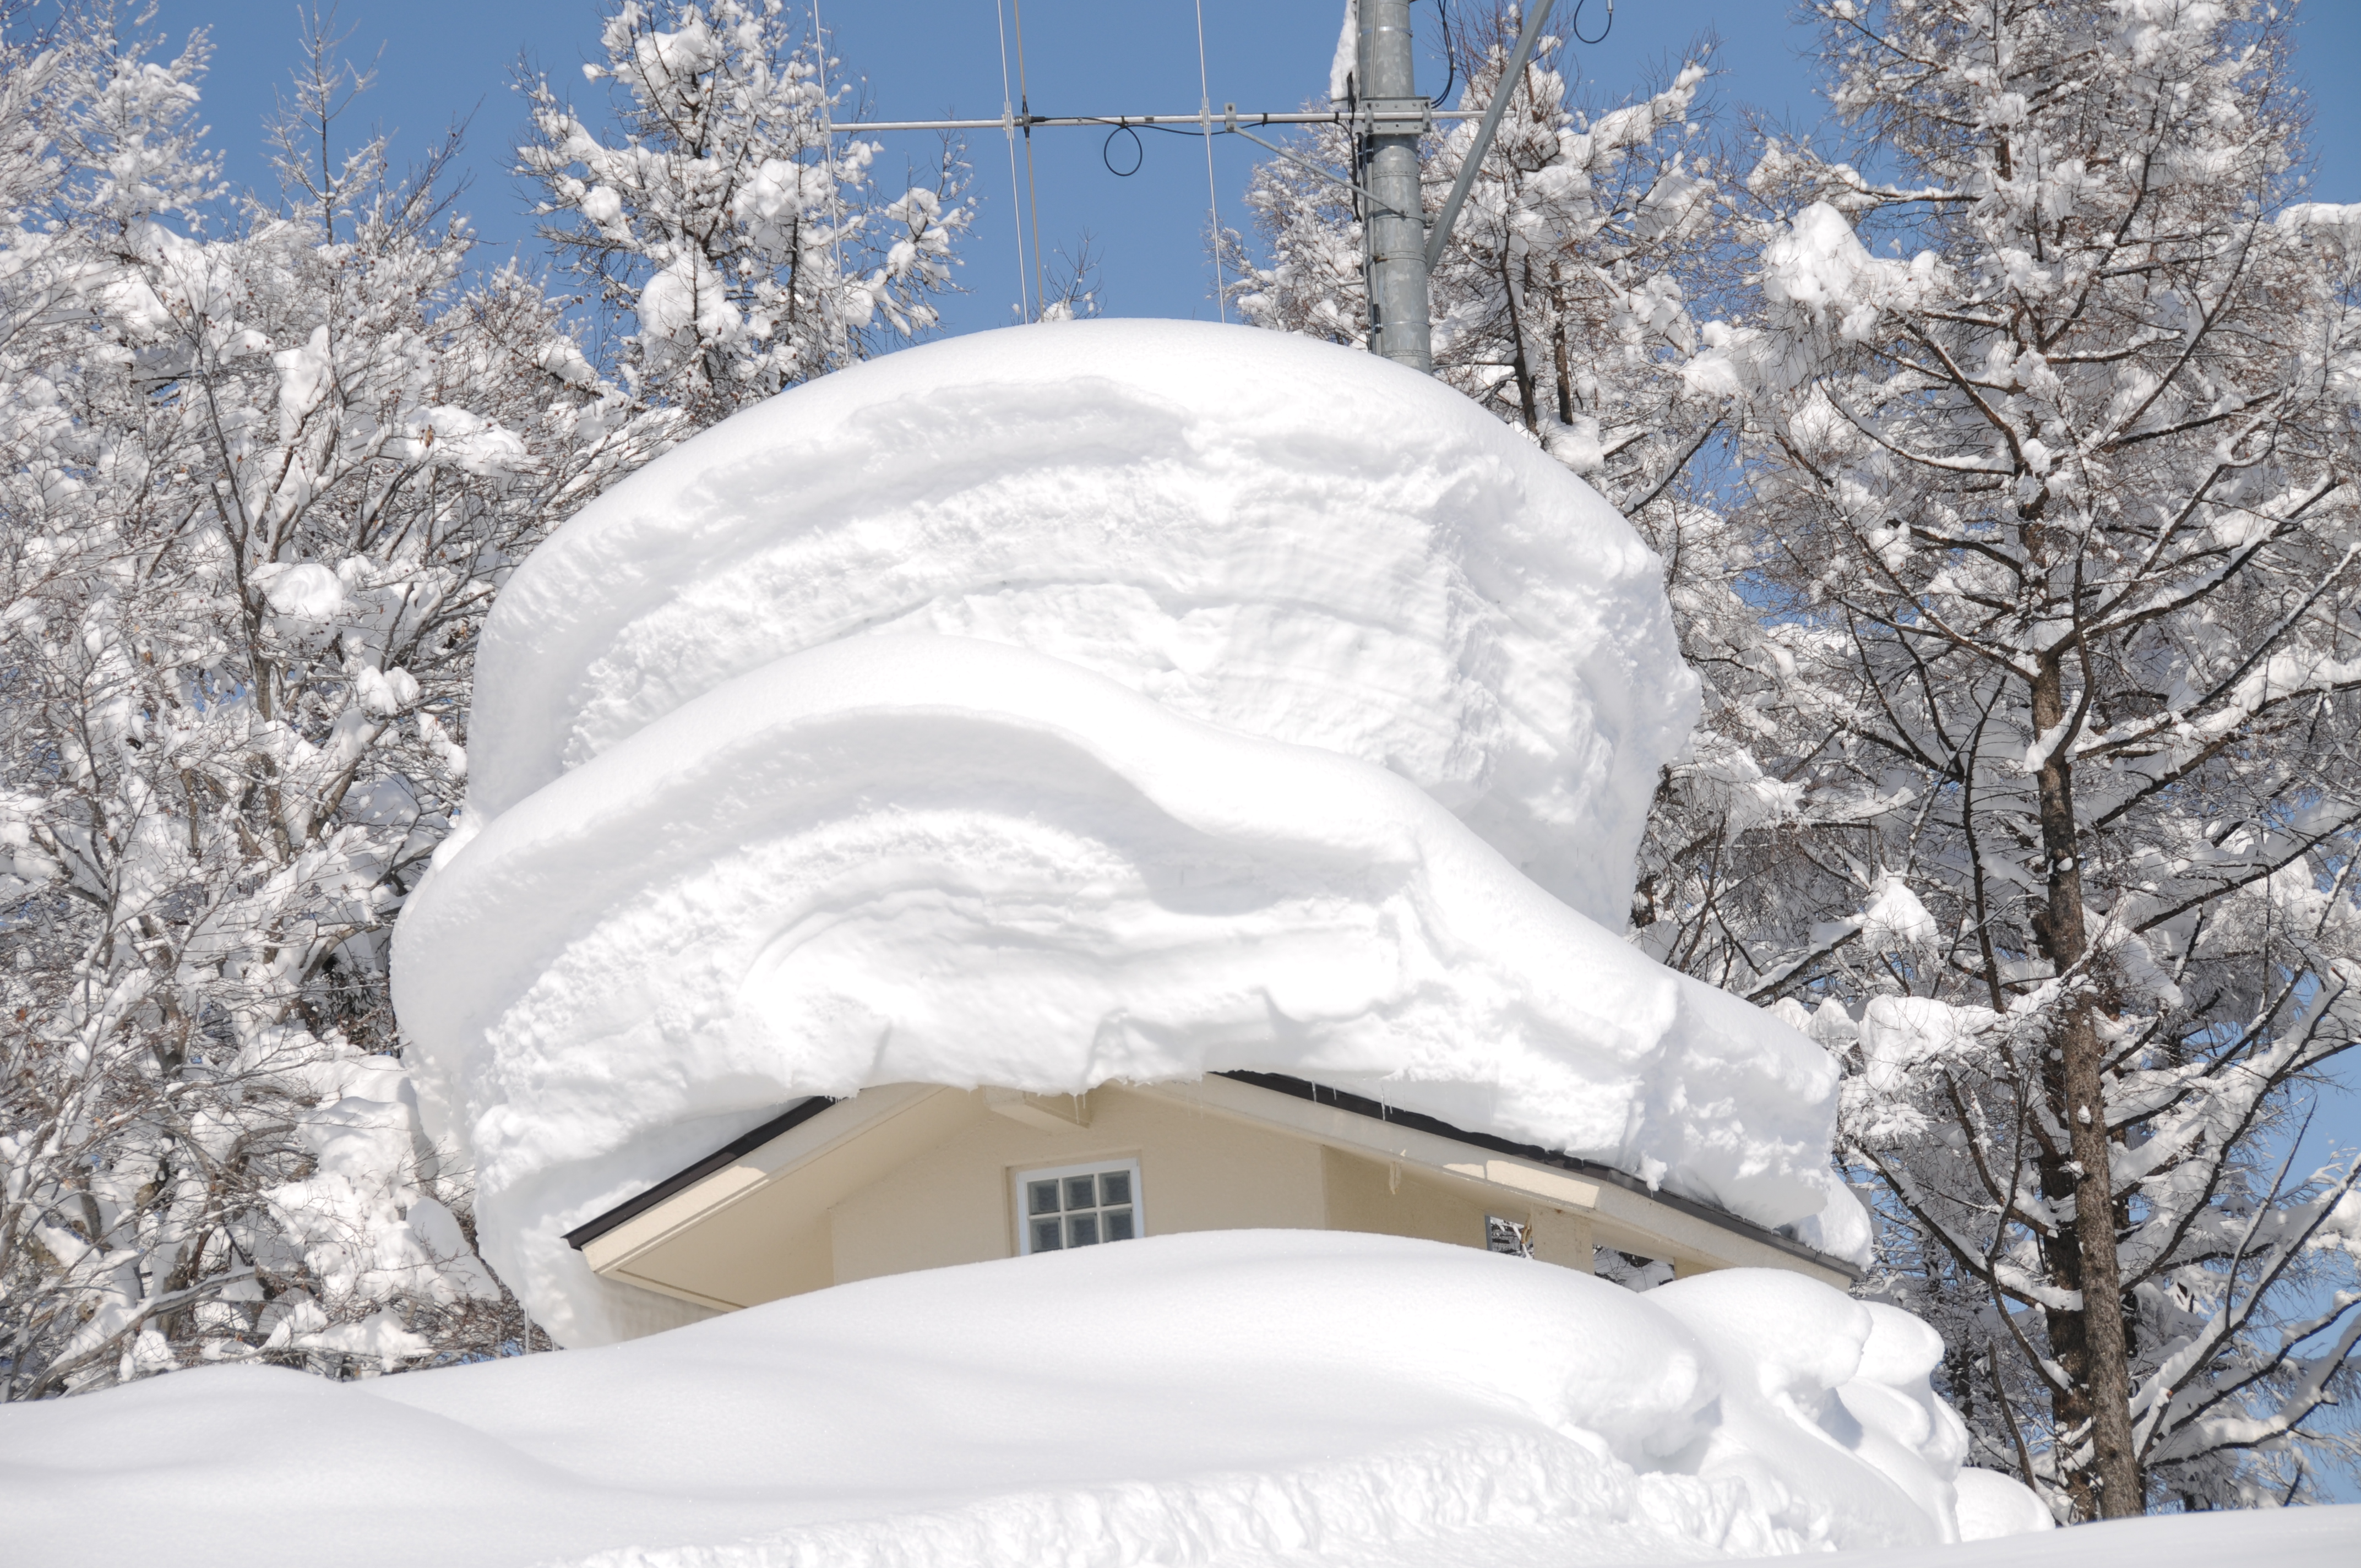 Strong Roof, Nozawa Onsen